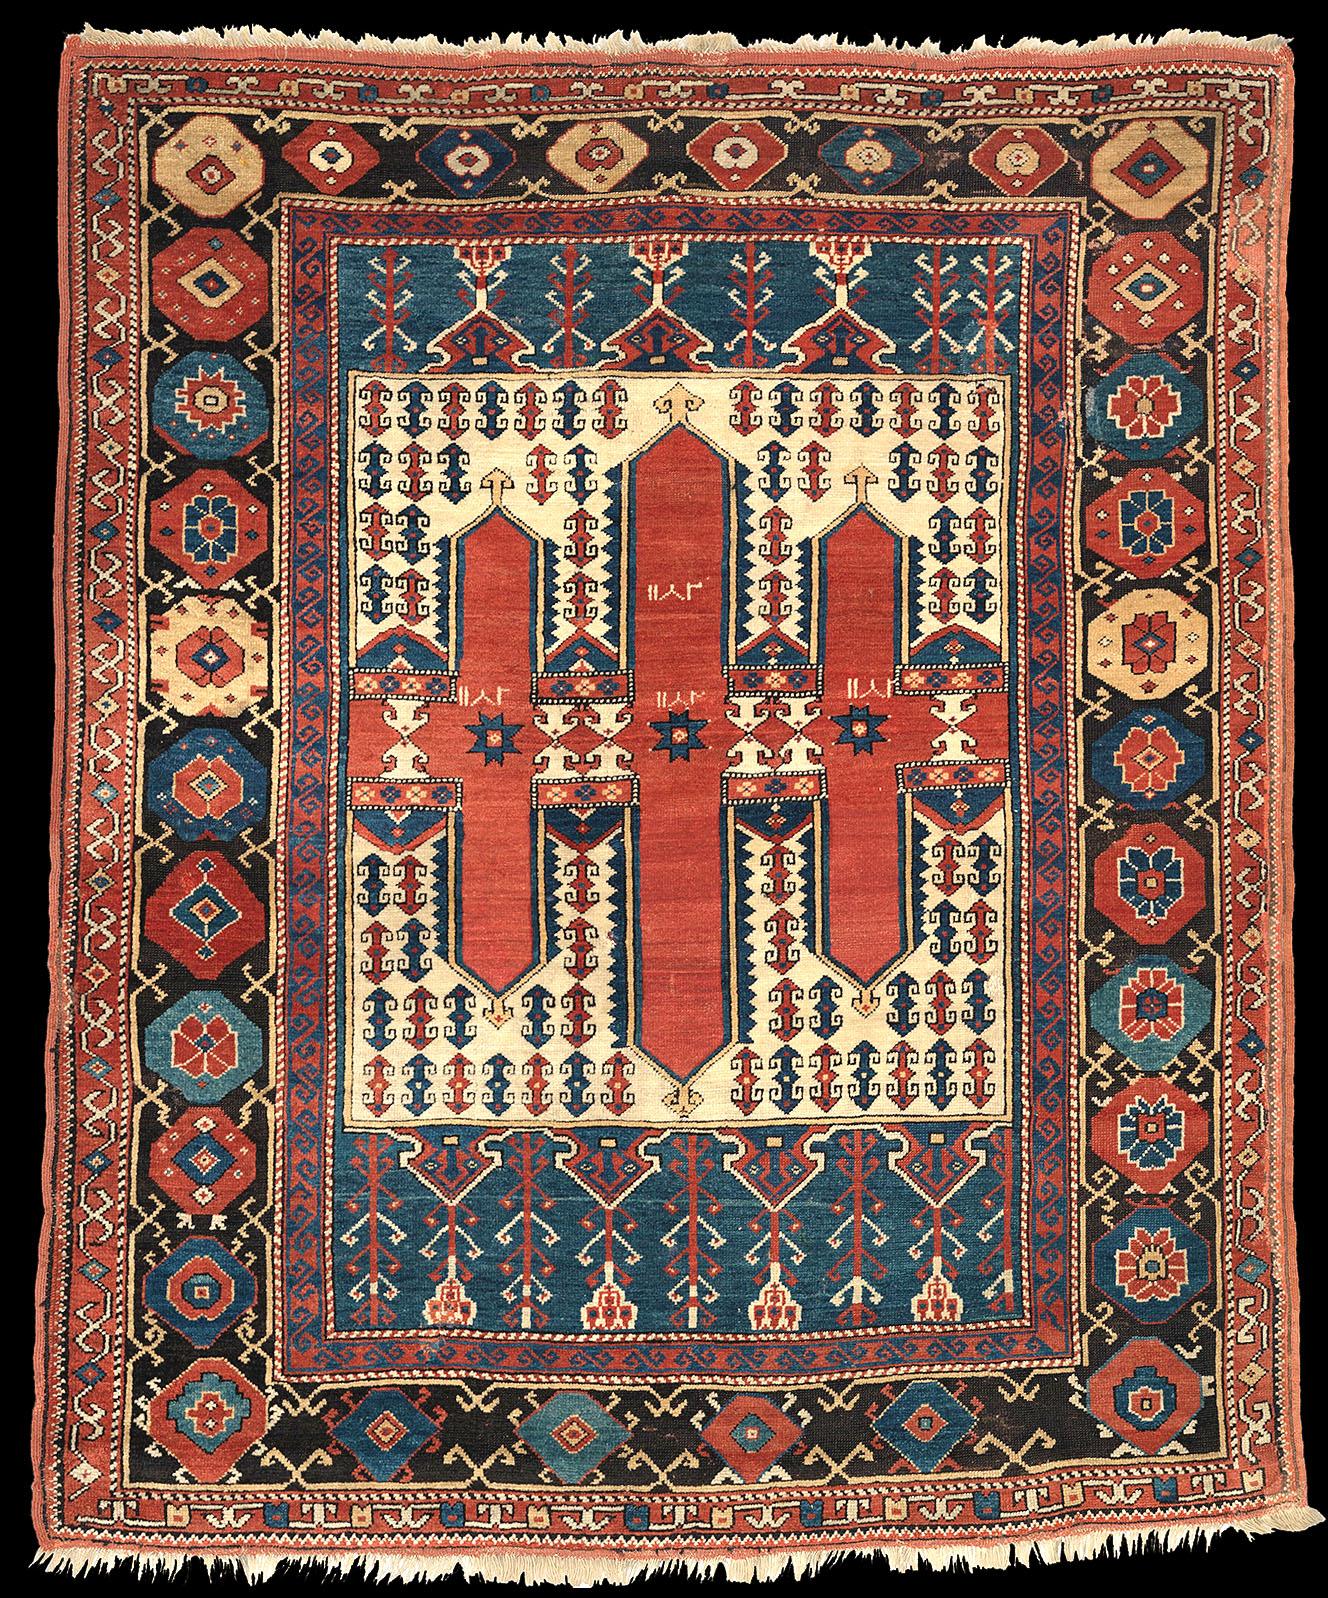 An antique Bergama village carpet of 18th century